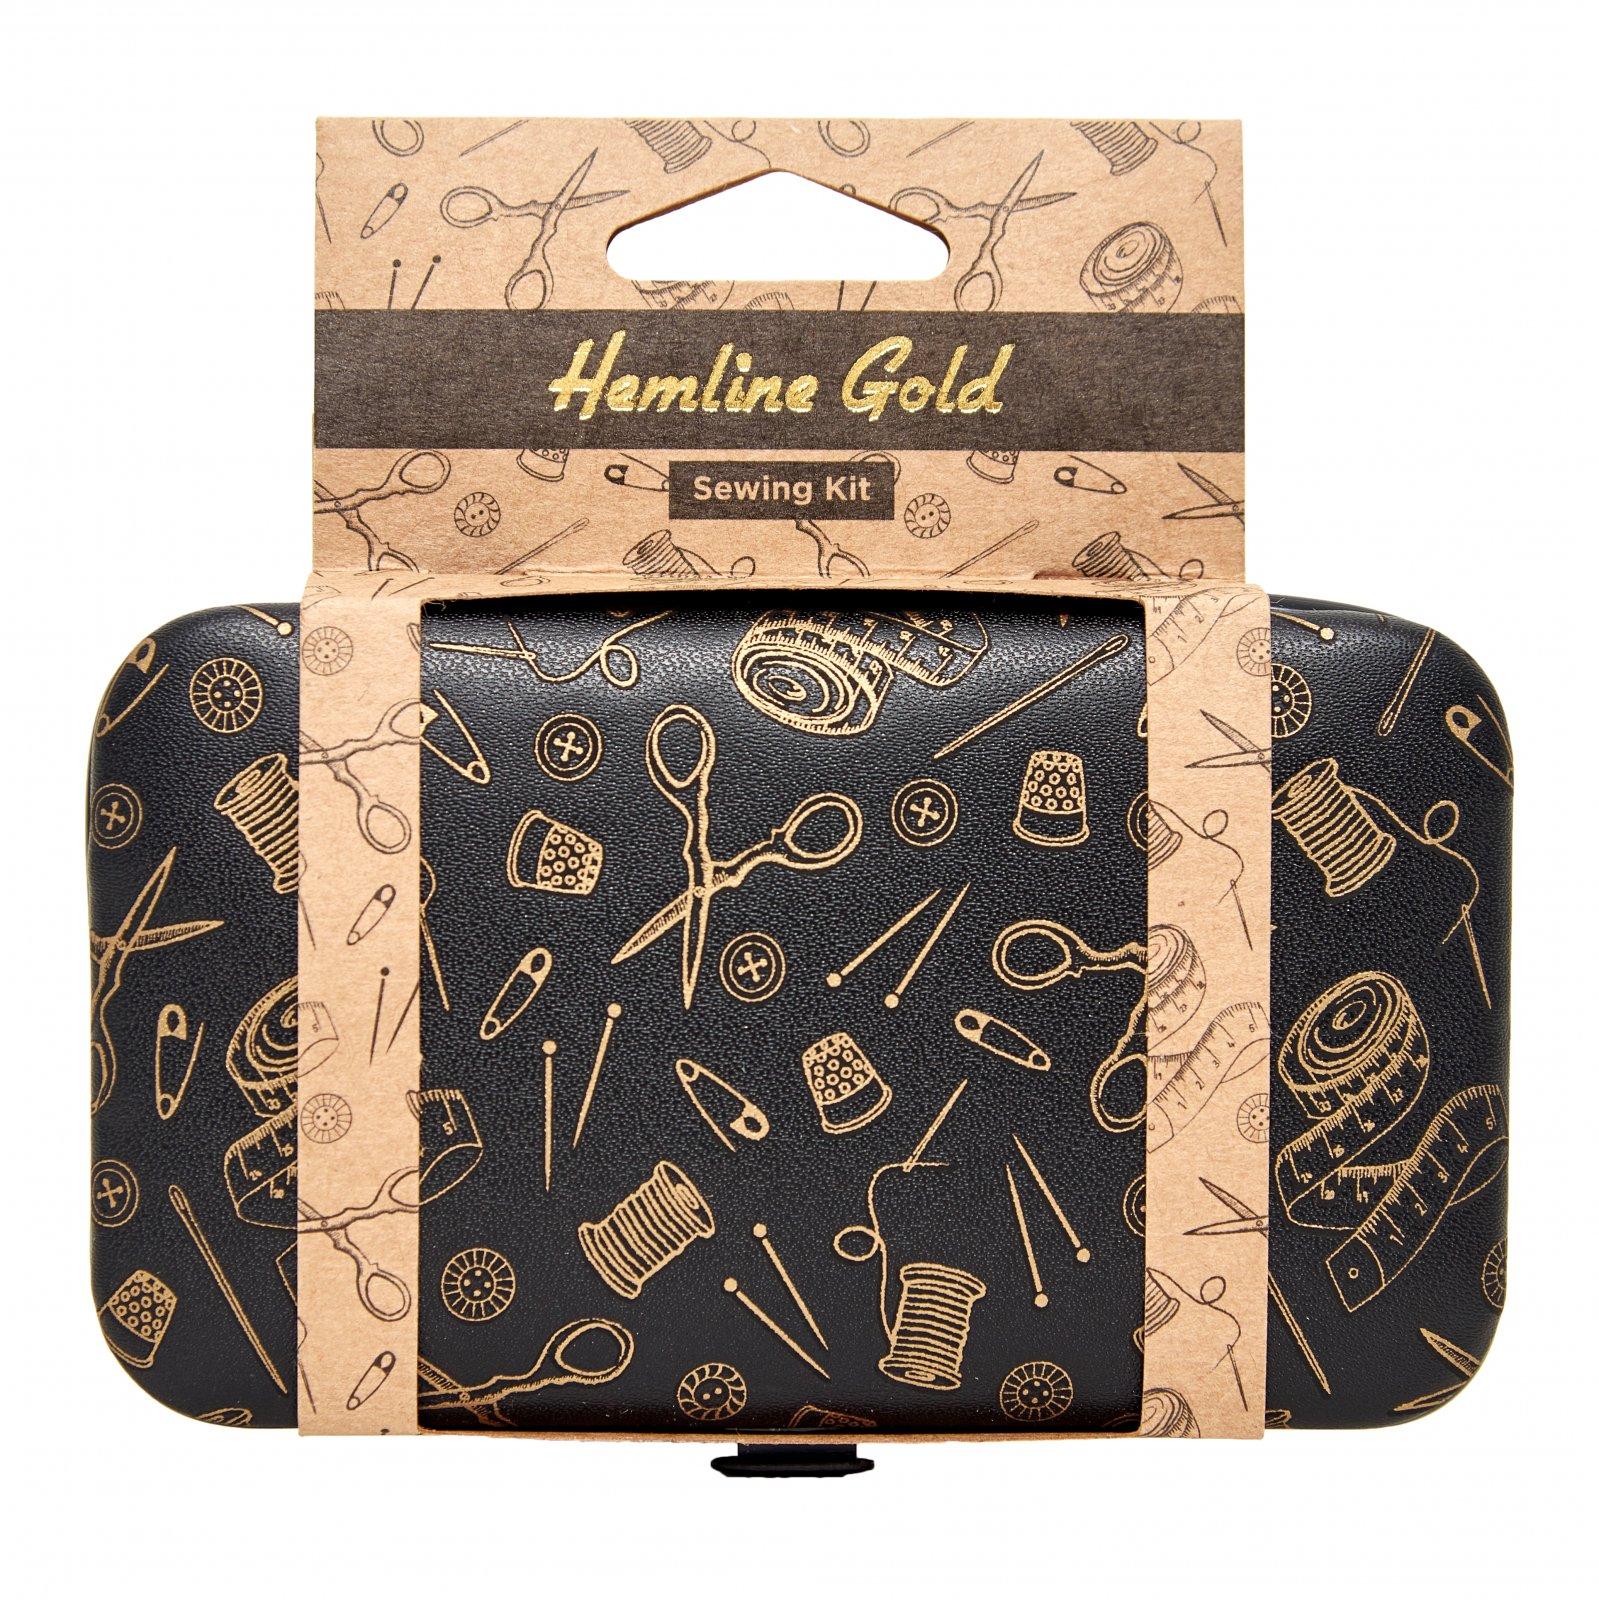 Sewing Kit - Hemline Gold